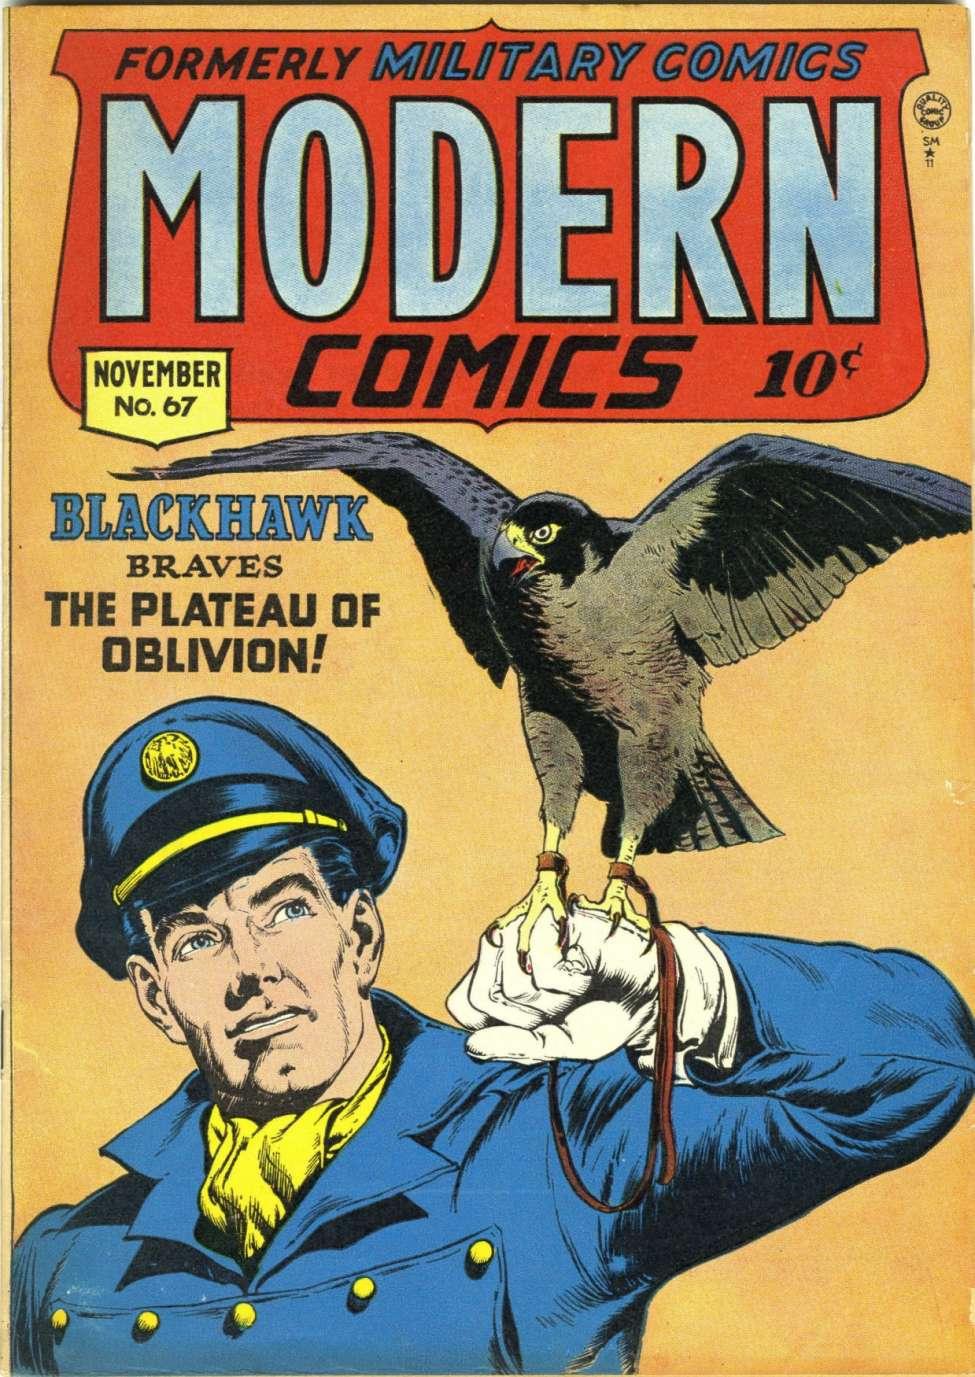 Modern Book Cover Ups ~ Modern comic book cover trendnet